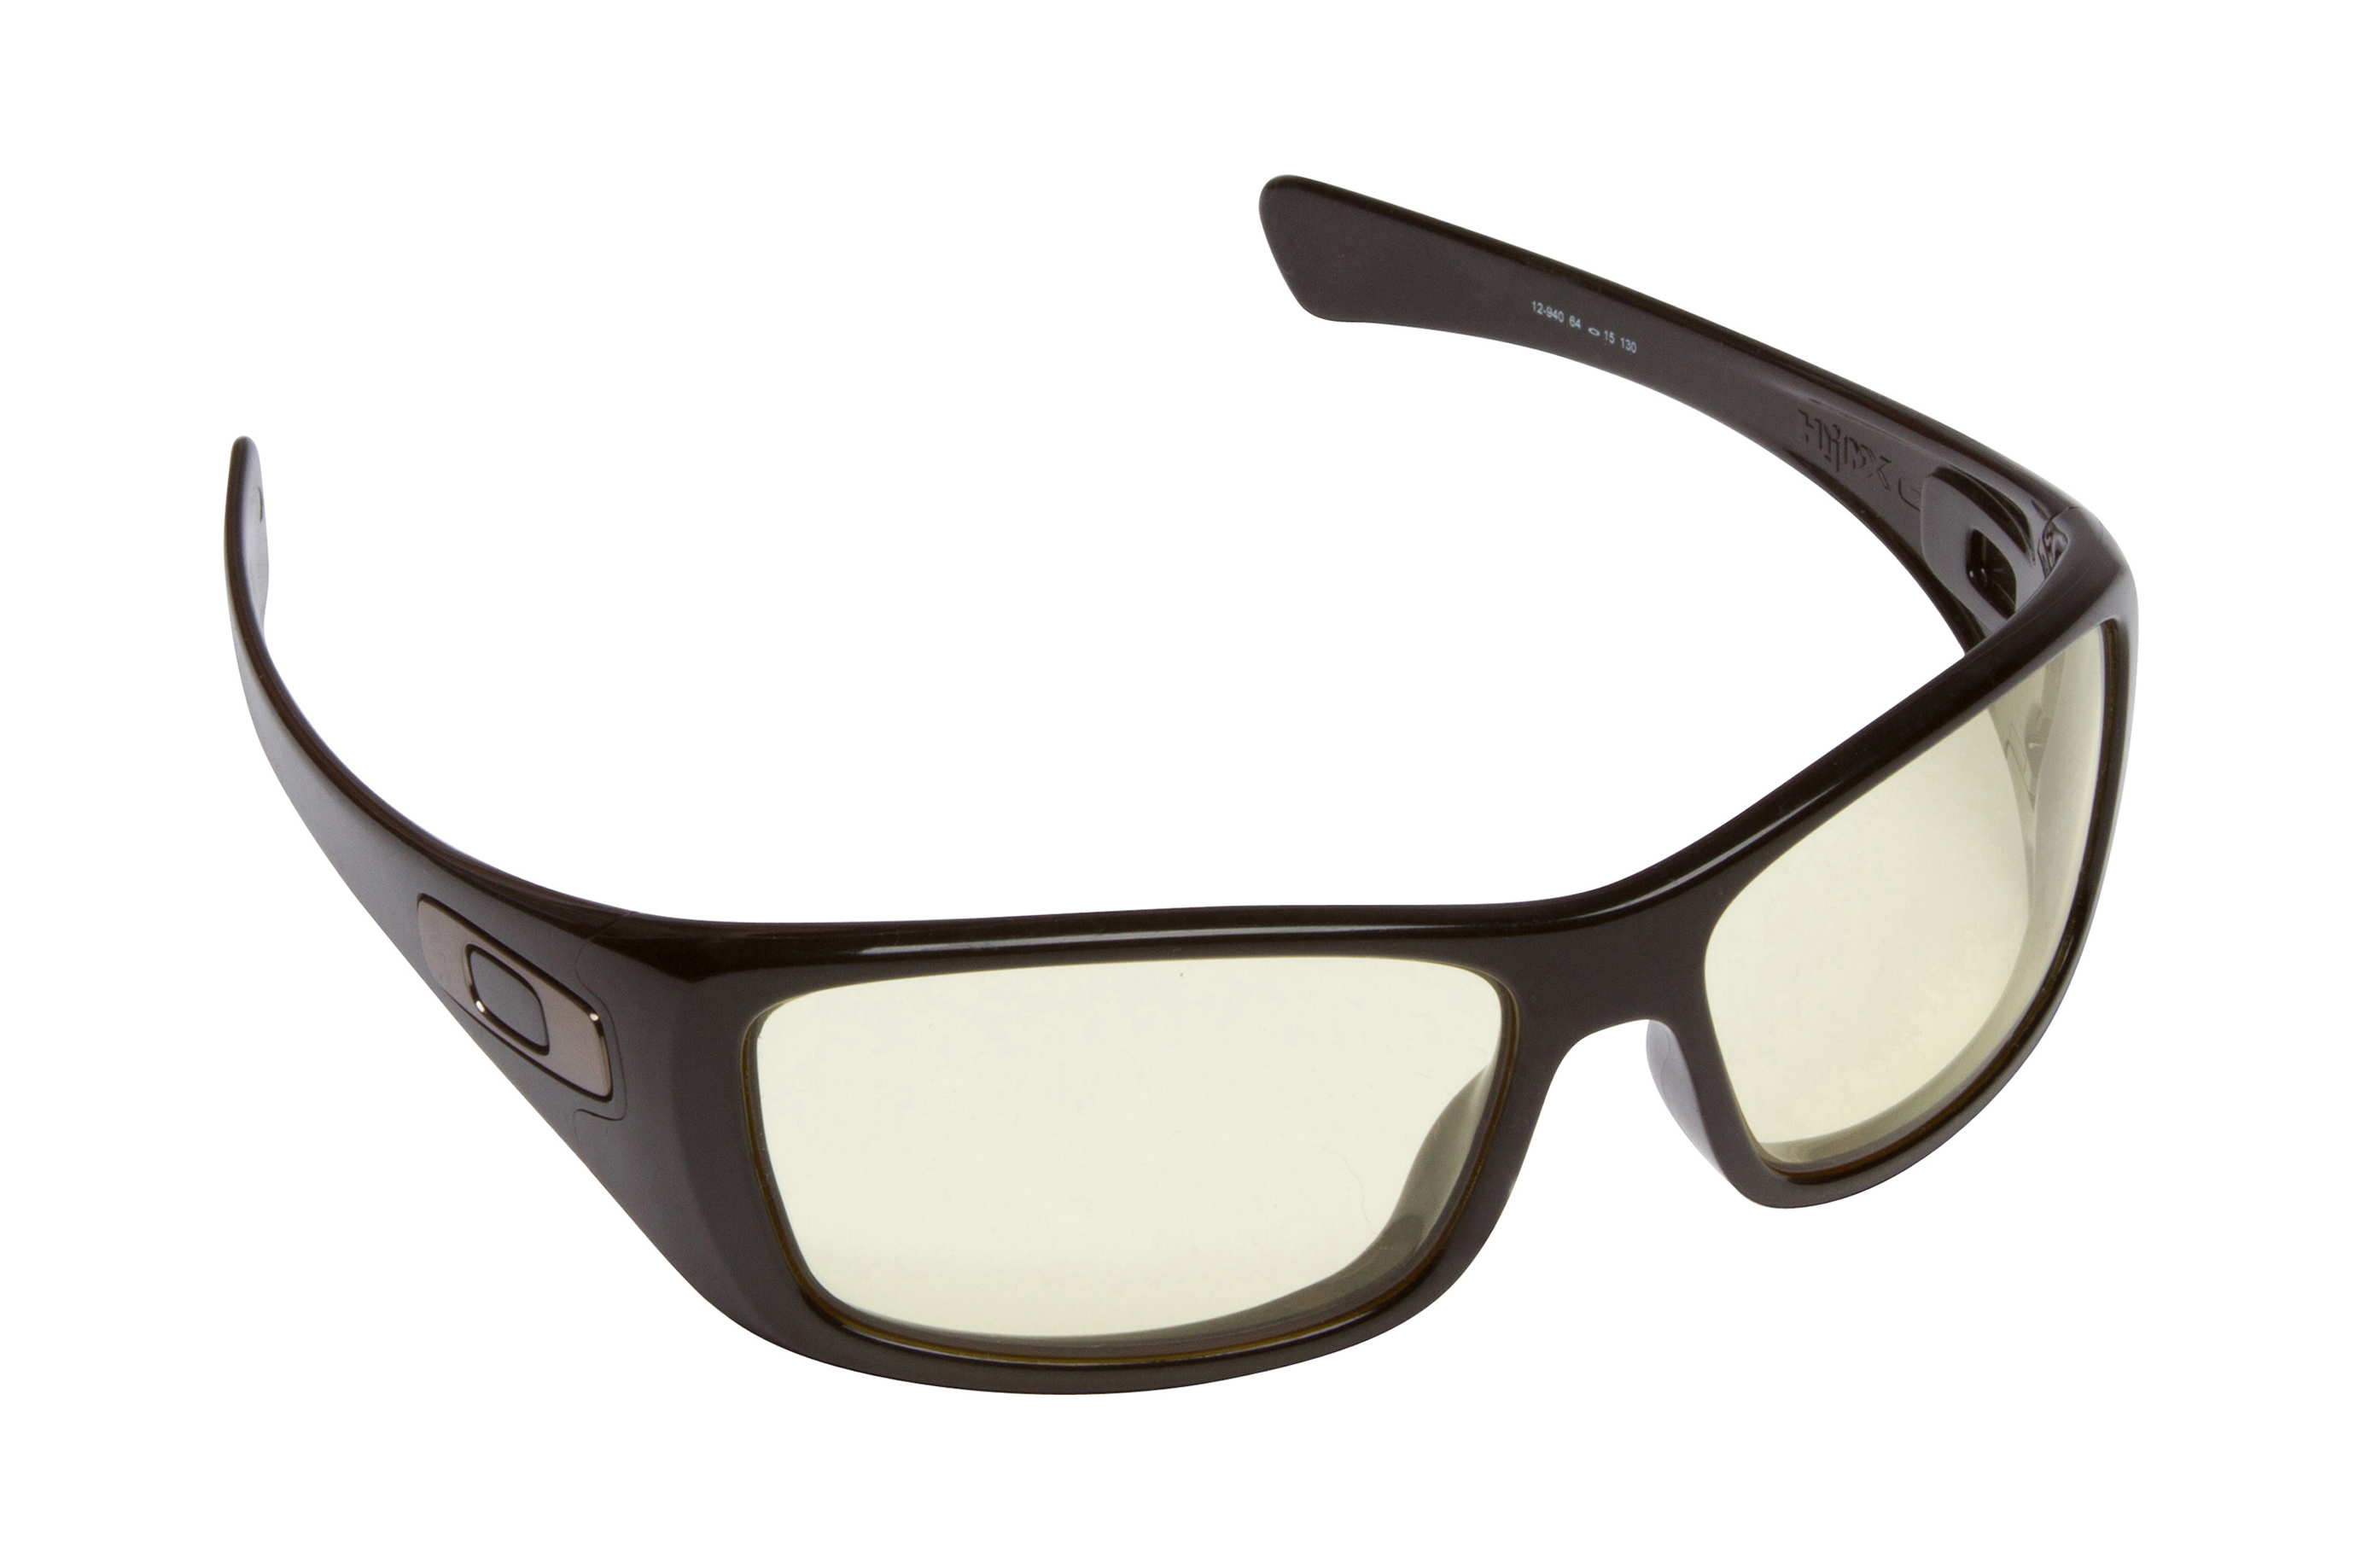 af18801d70f Seek Optics - Hijinx Replacement Lenses Hi Intensity Yellow by SEEK fits  OAKLEY Sunglasses - Walmart.com